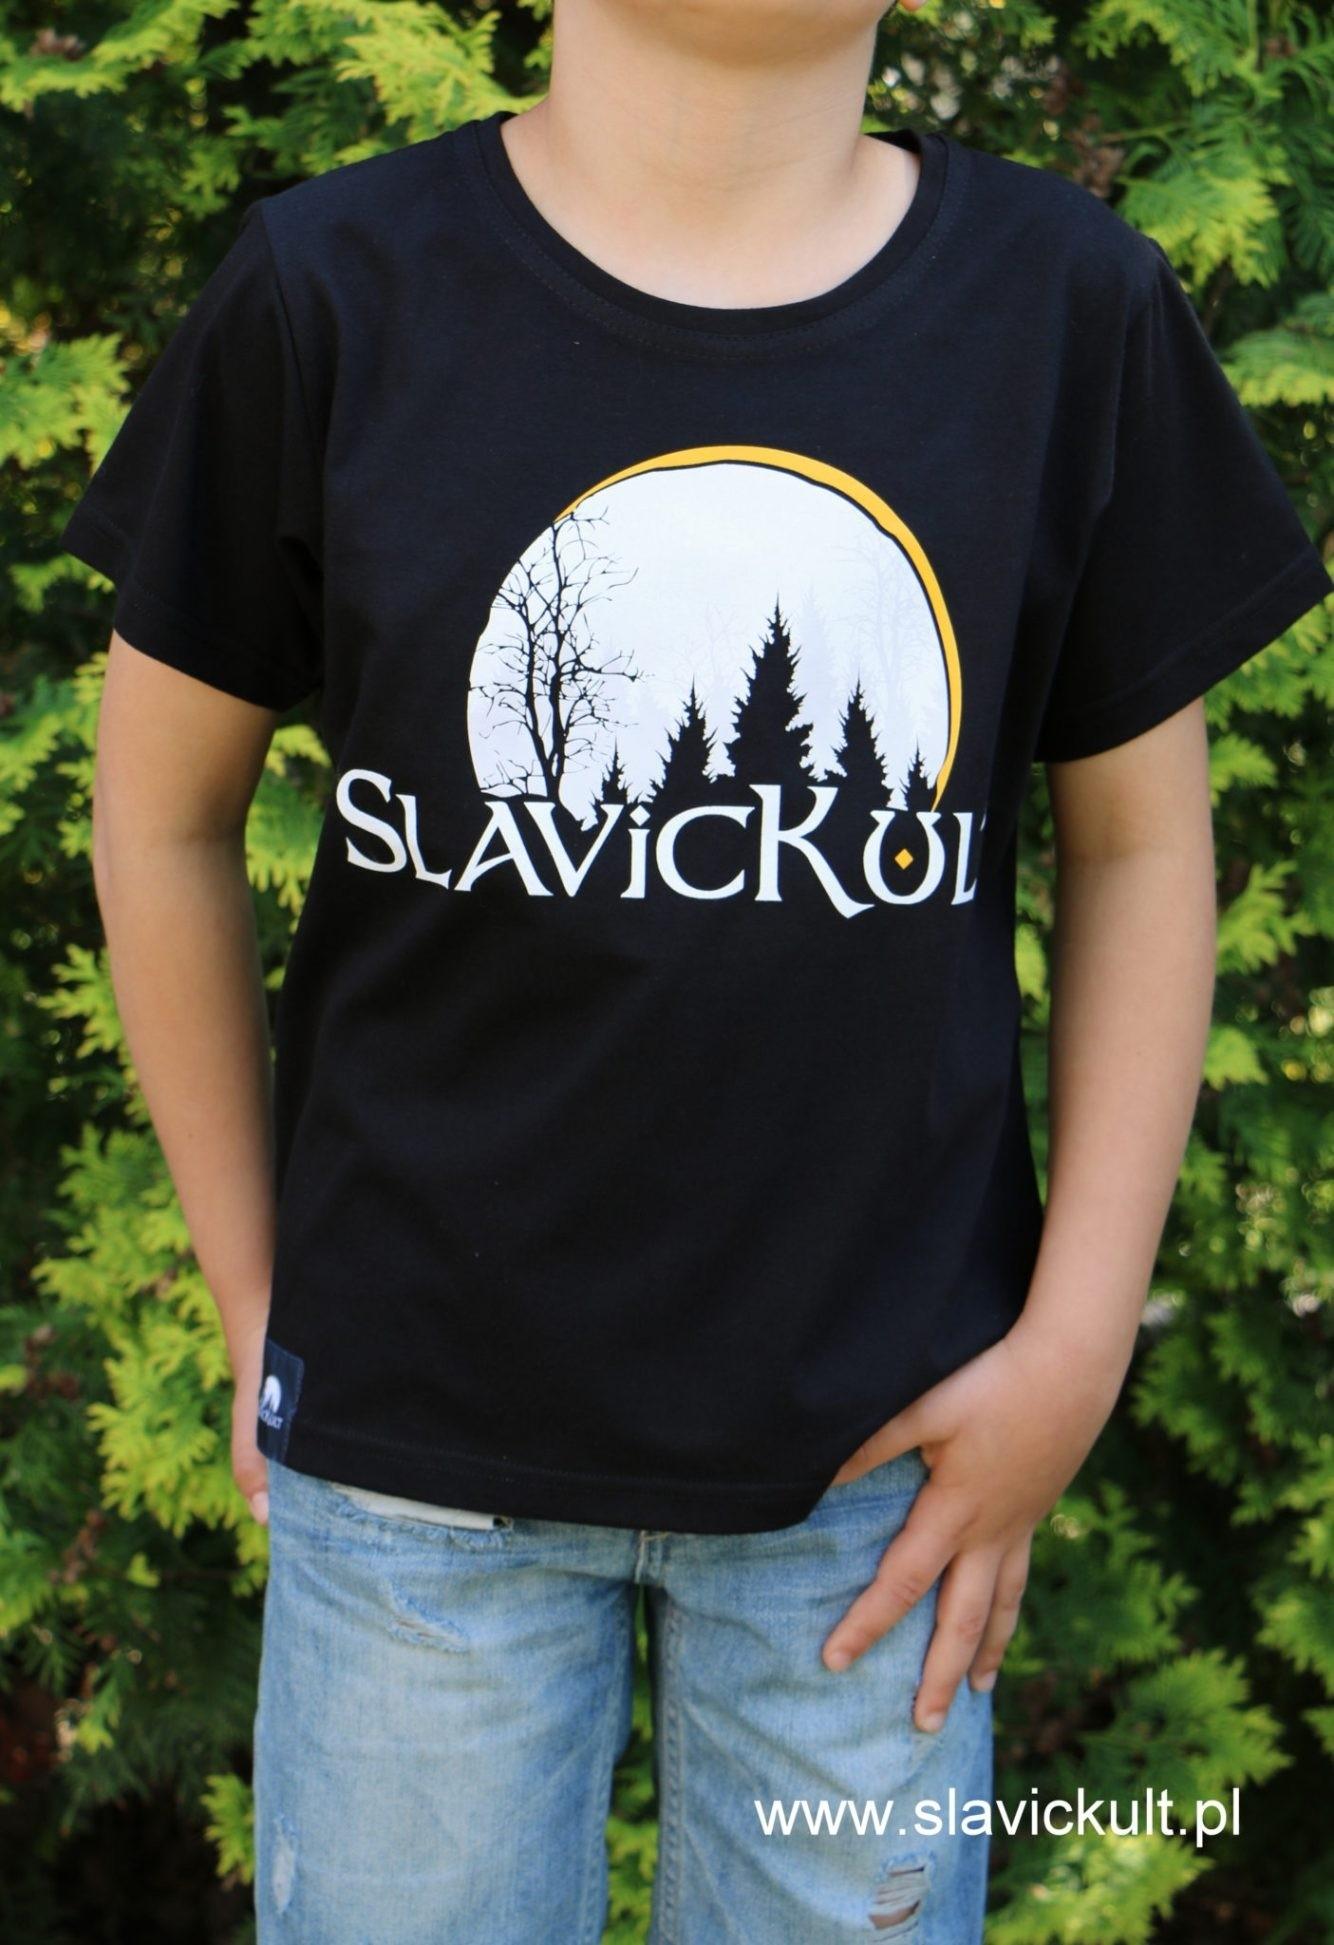 Koszulka Slavickult (Czarna) dla dziecka